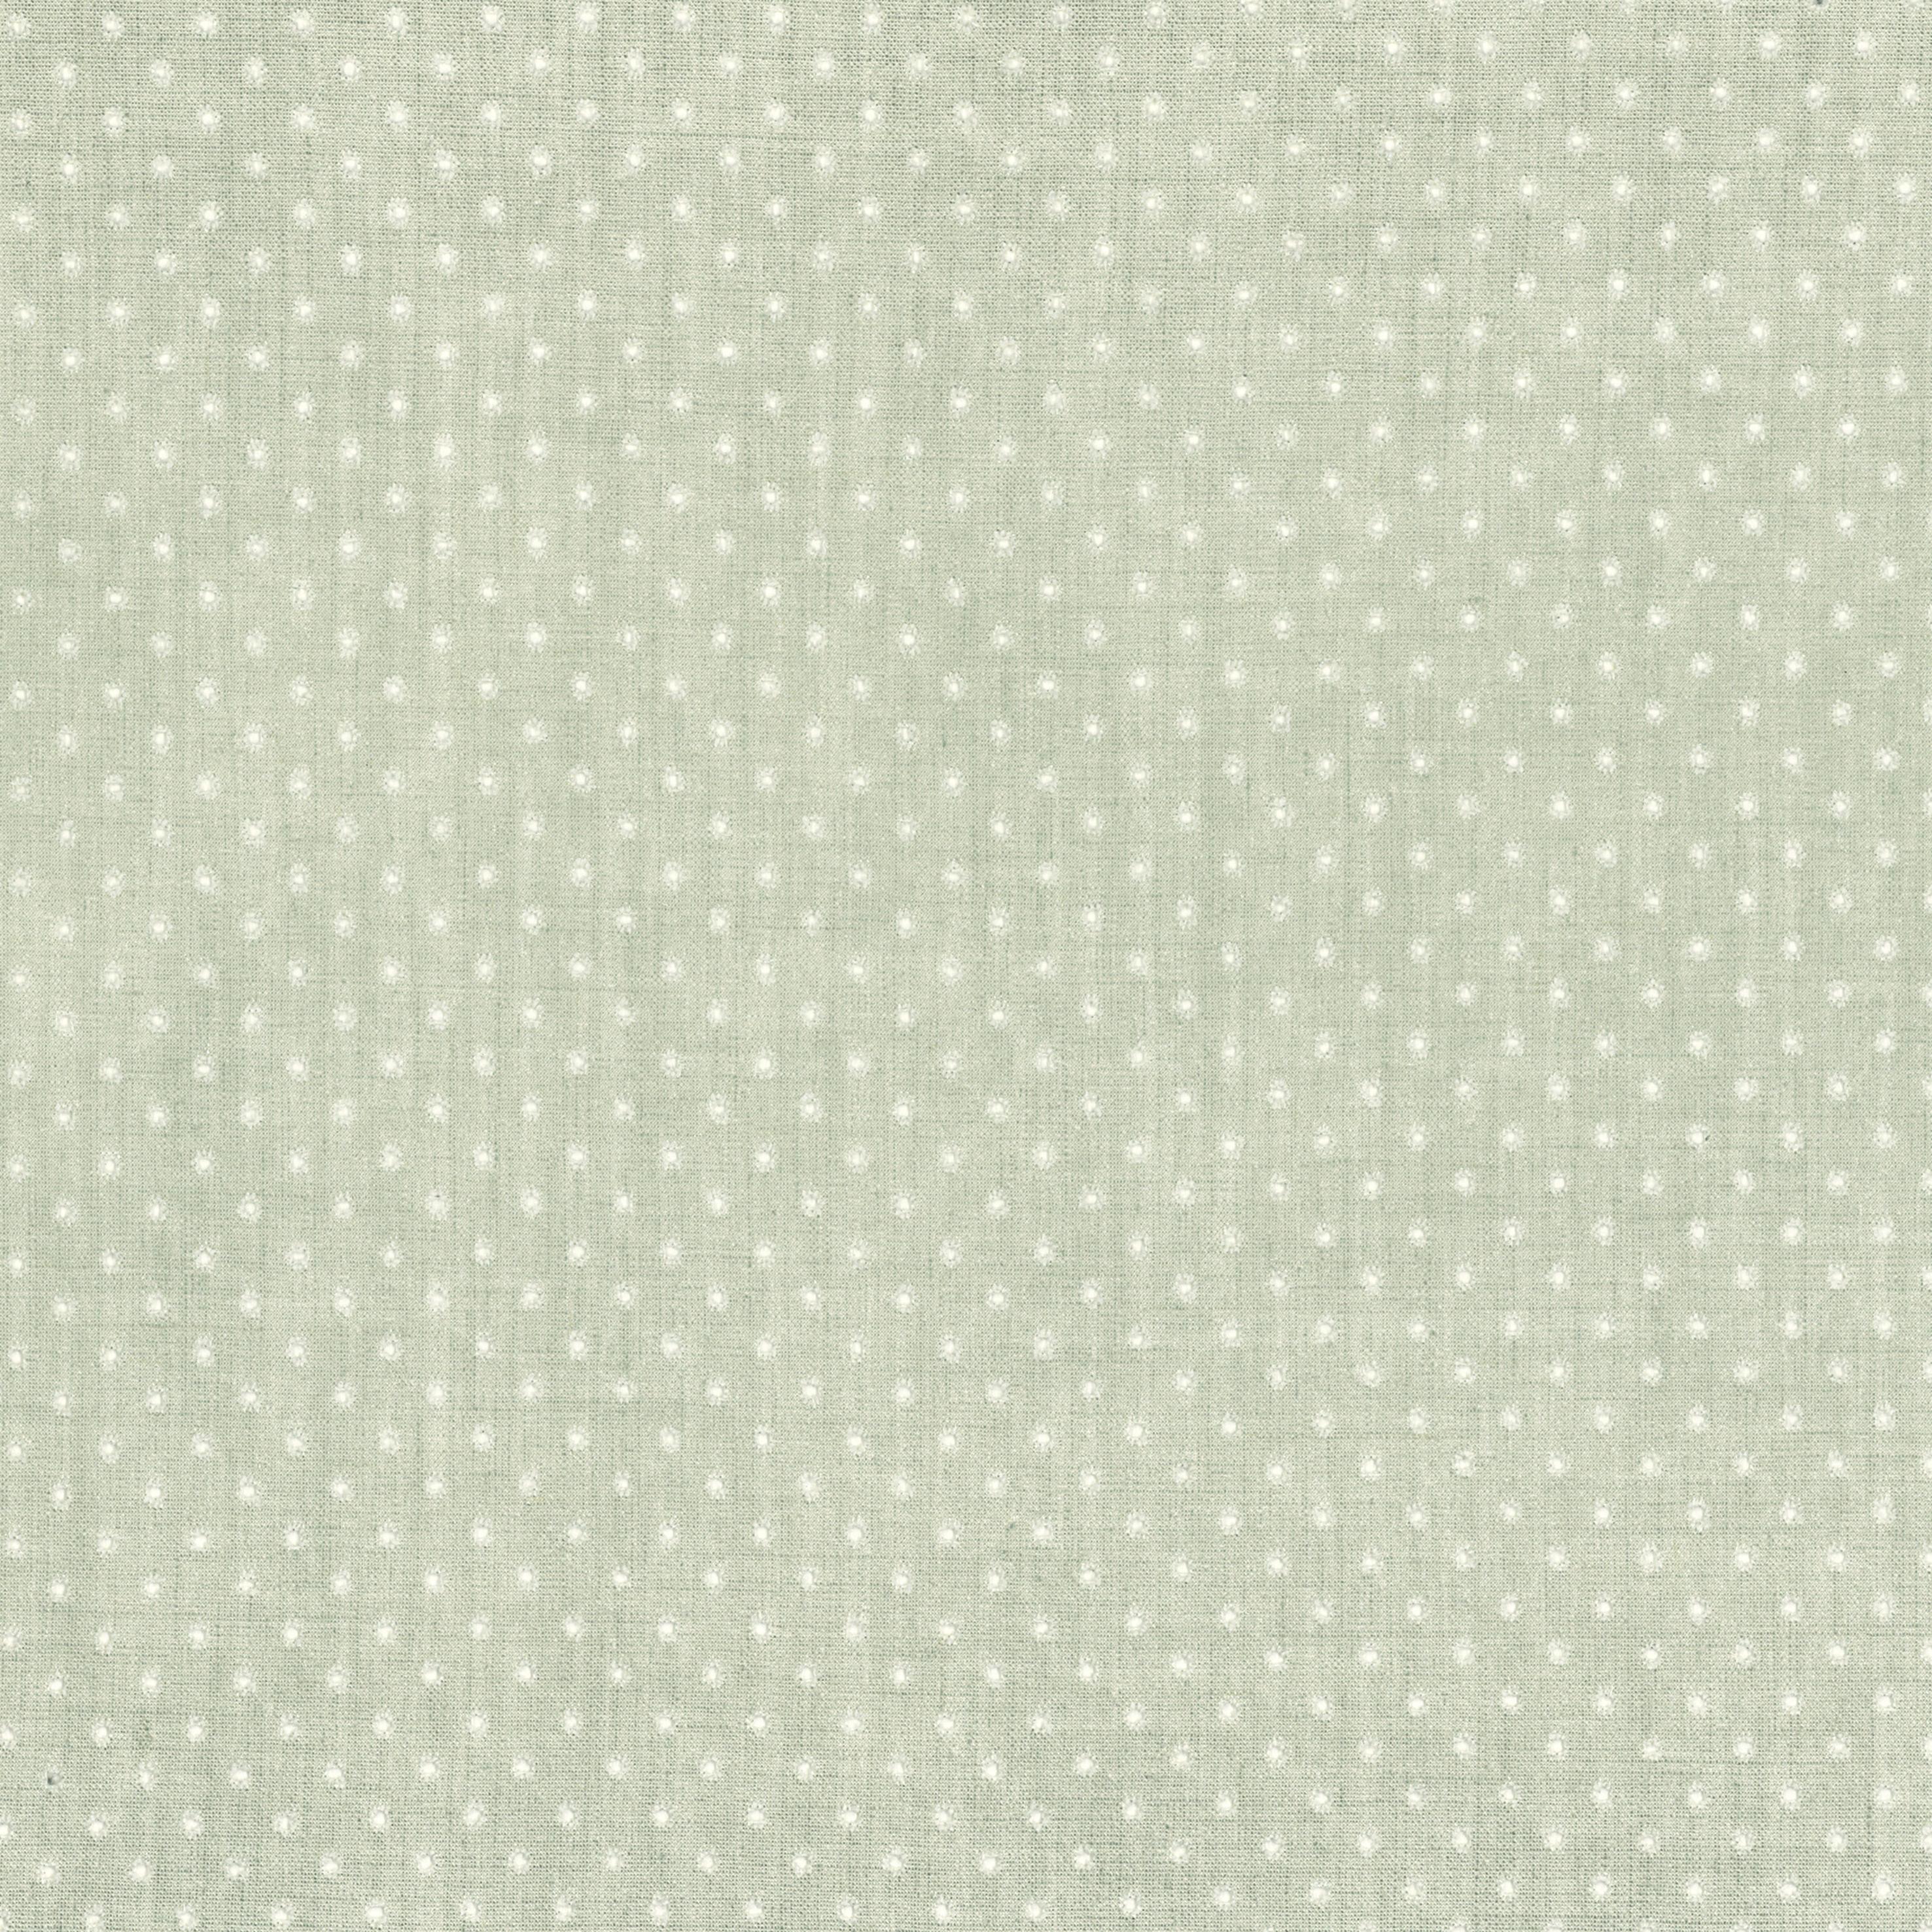 Zepel Fabrics Casamance Fabrics Wallpapers SHIZEN DAMARA 2953x2953